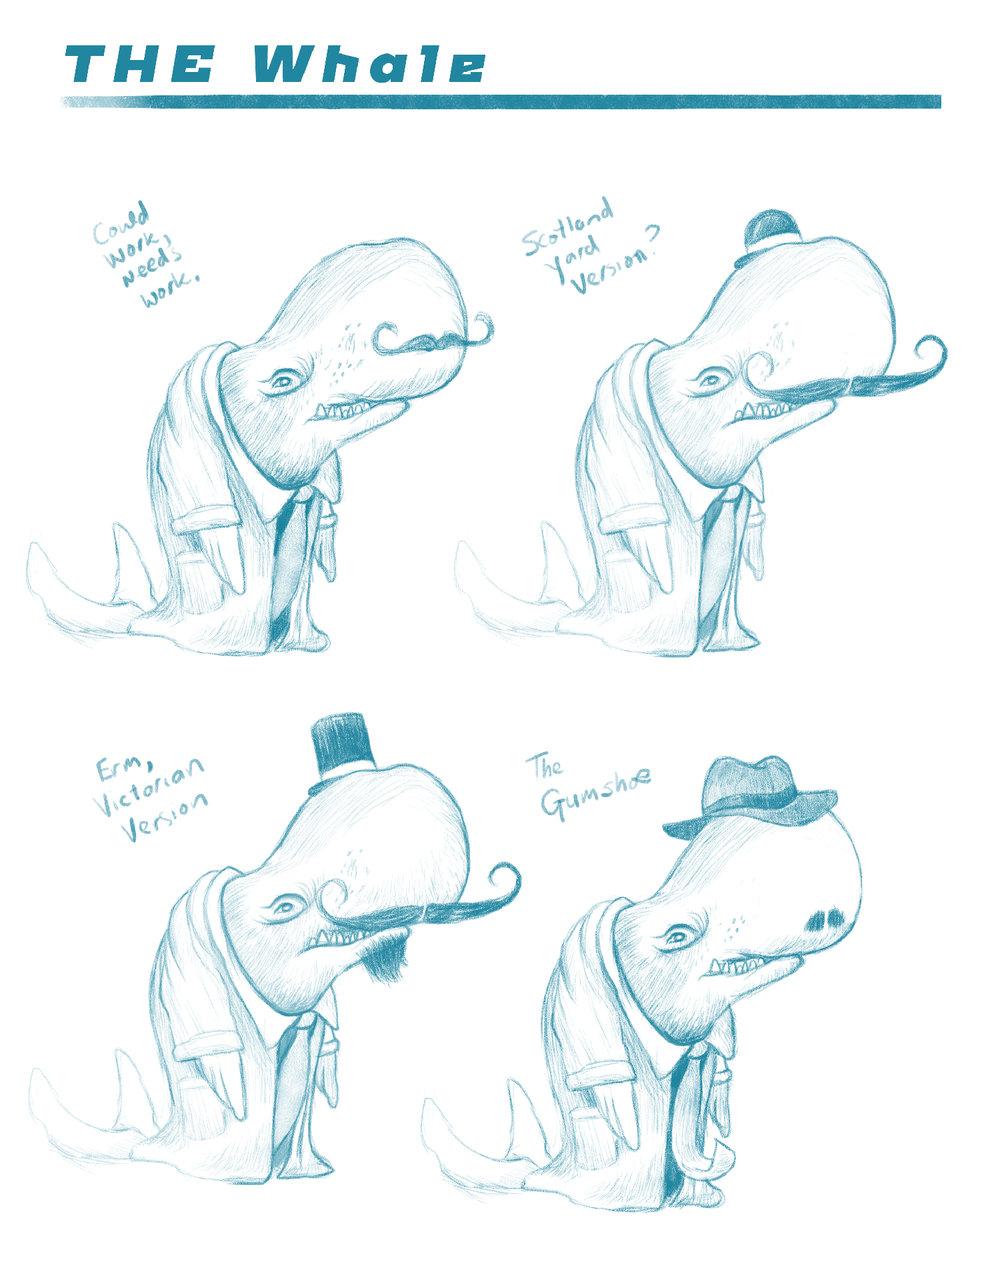 thewhale-gumshoe2.jpg